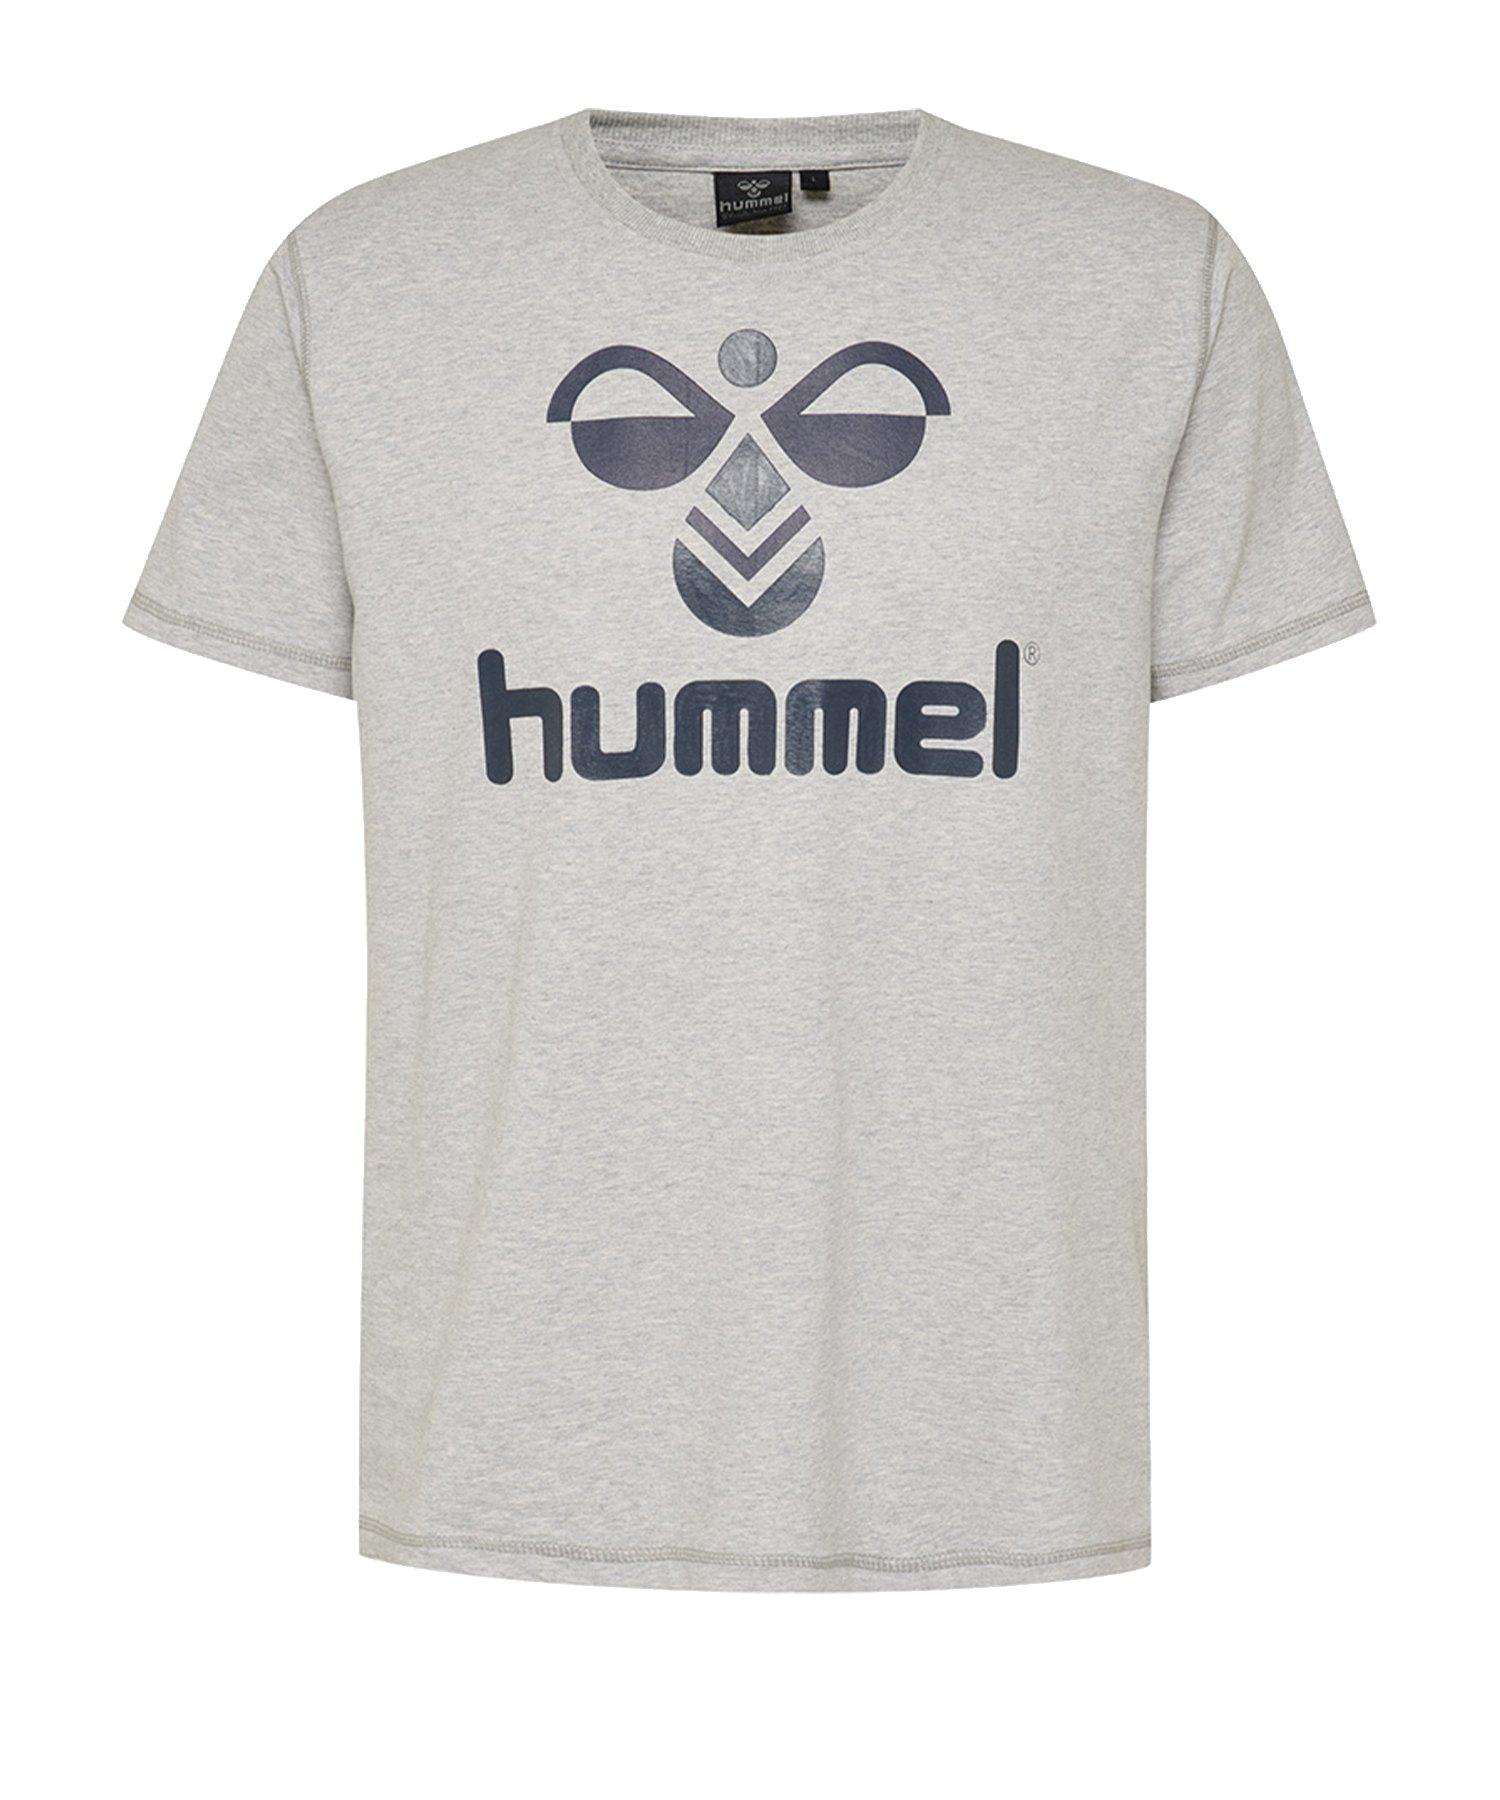 Hummel Classic Bee T-Shirt Kids Kids Grau F2006 - Grau